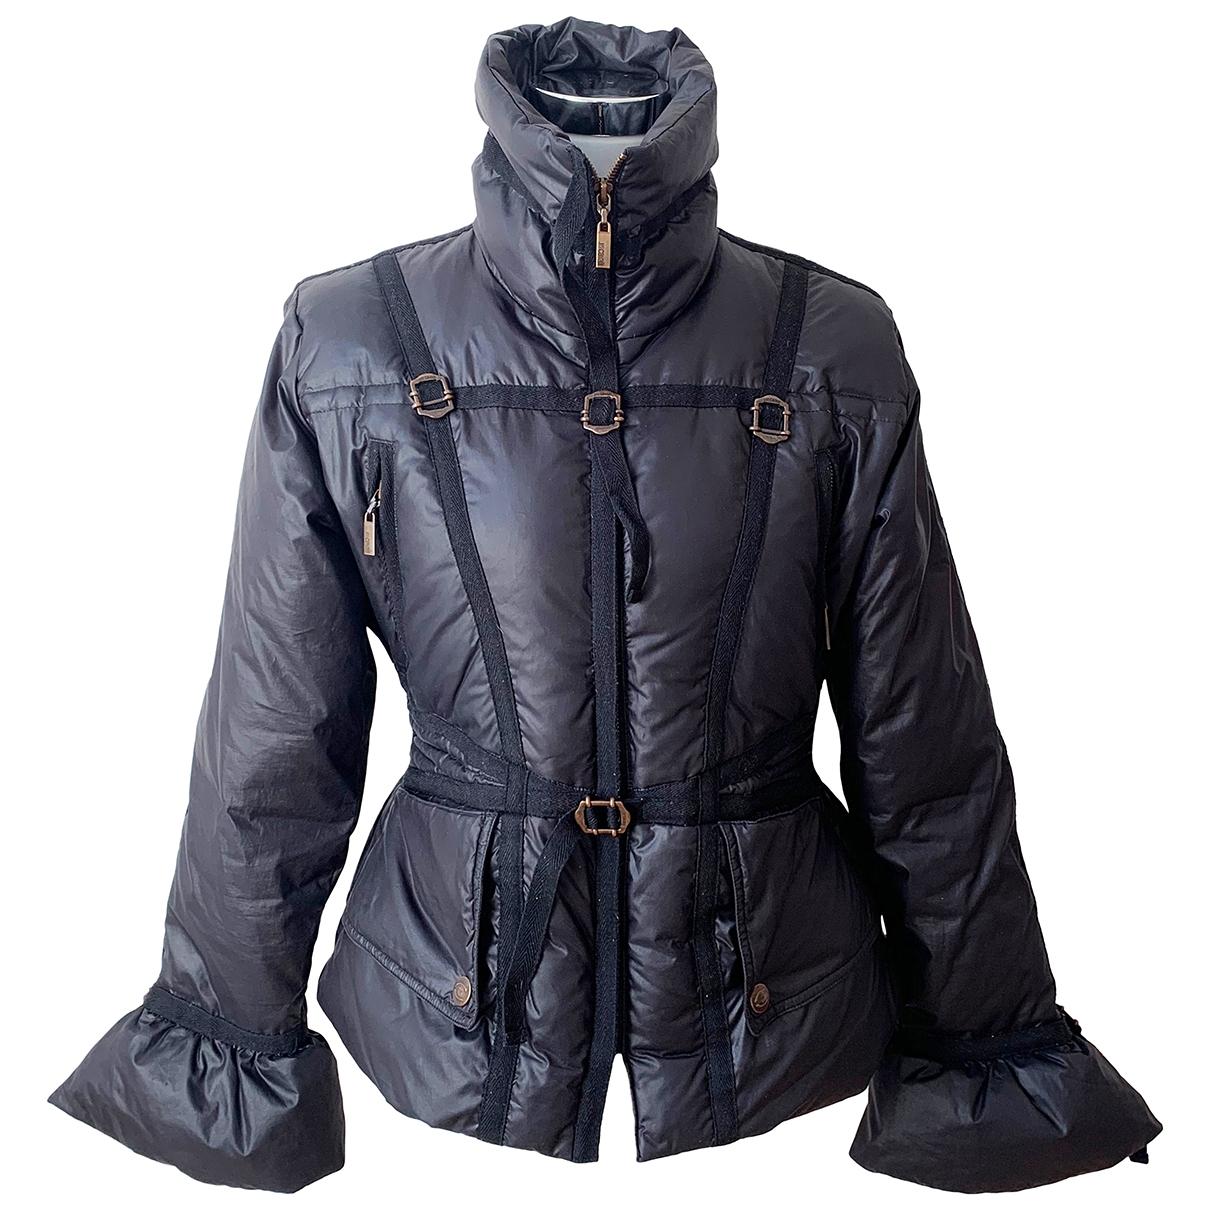 Just Cavalli \N Black jacket for Women S International